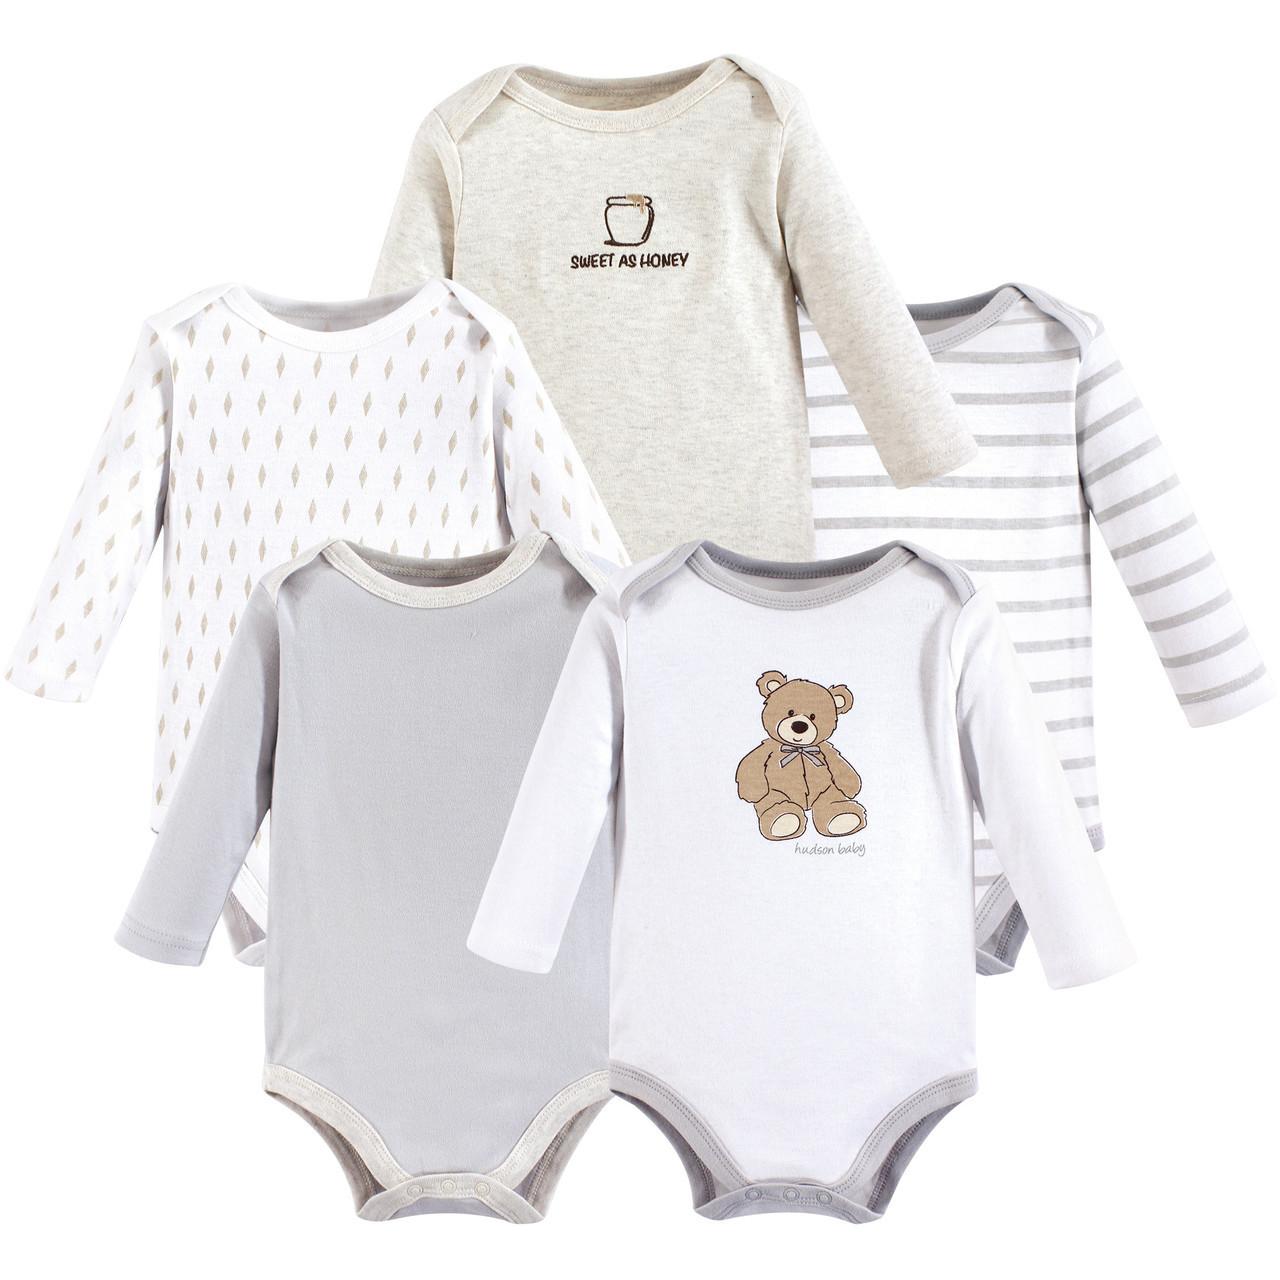 Hudson baby Long Sleeve Bodysuits